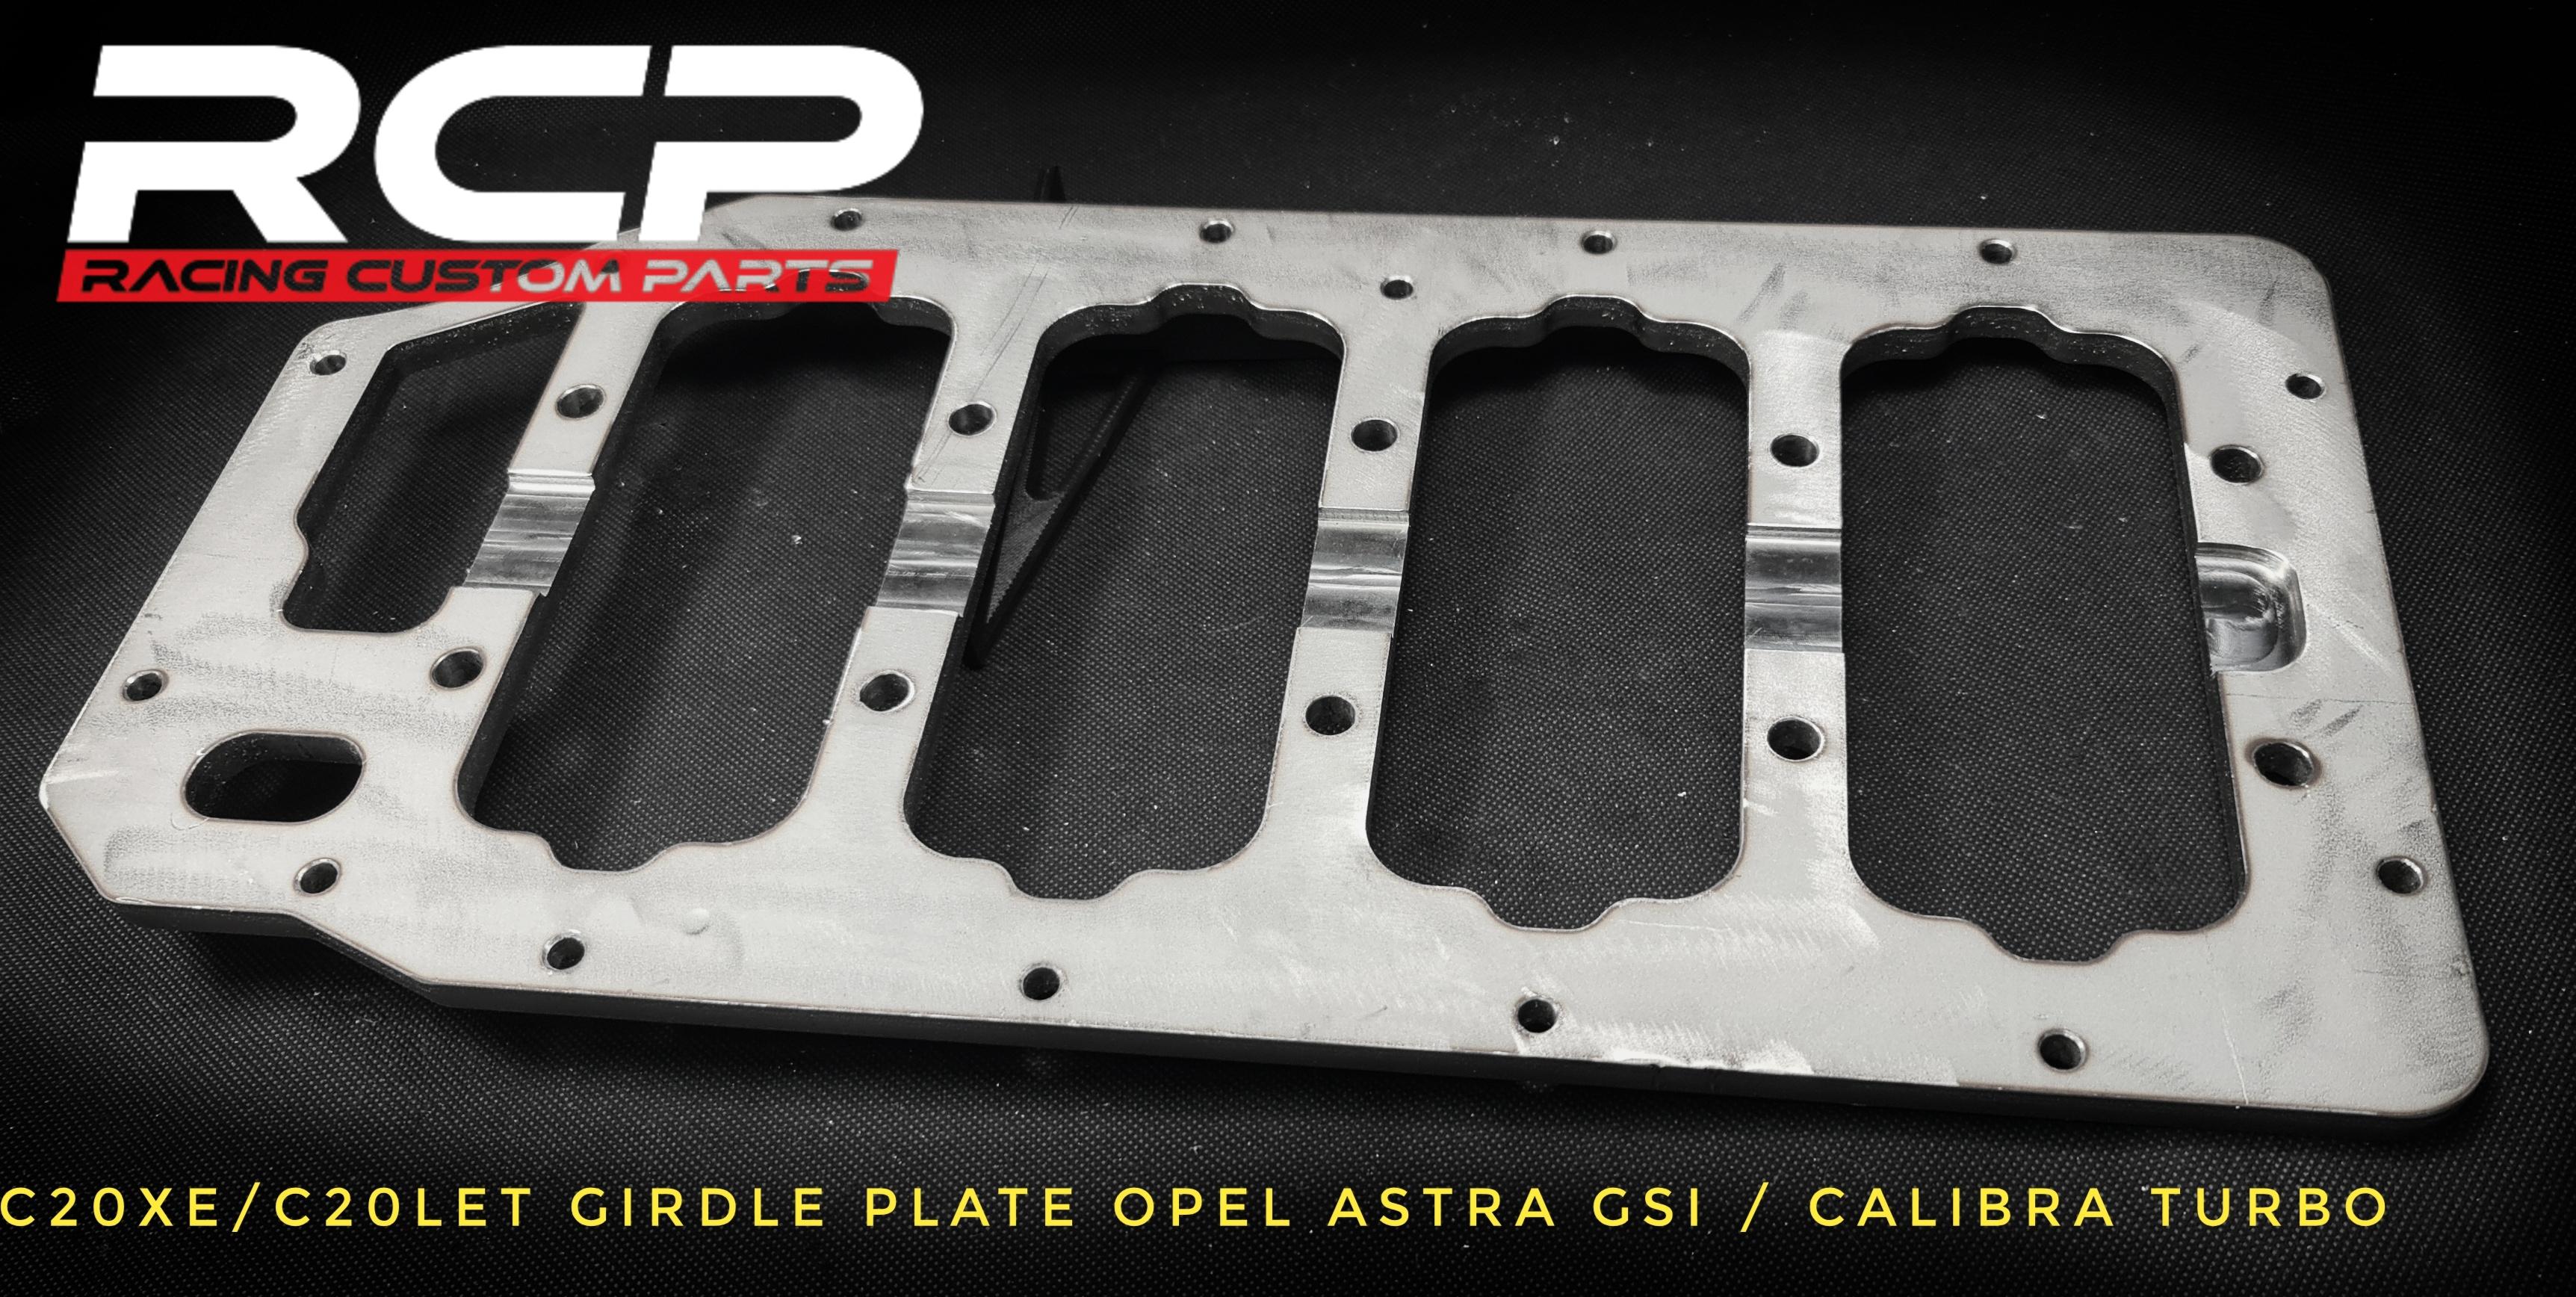 opel calibra turbo c20xe c20let girdle plate billet cnc racing custom parts